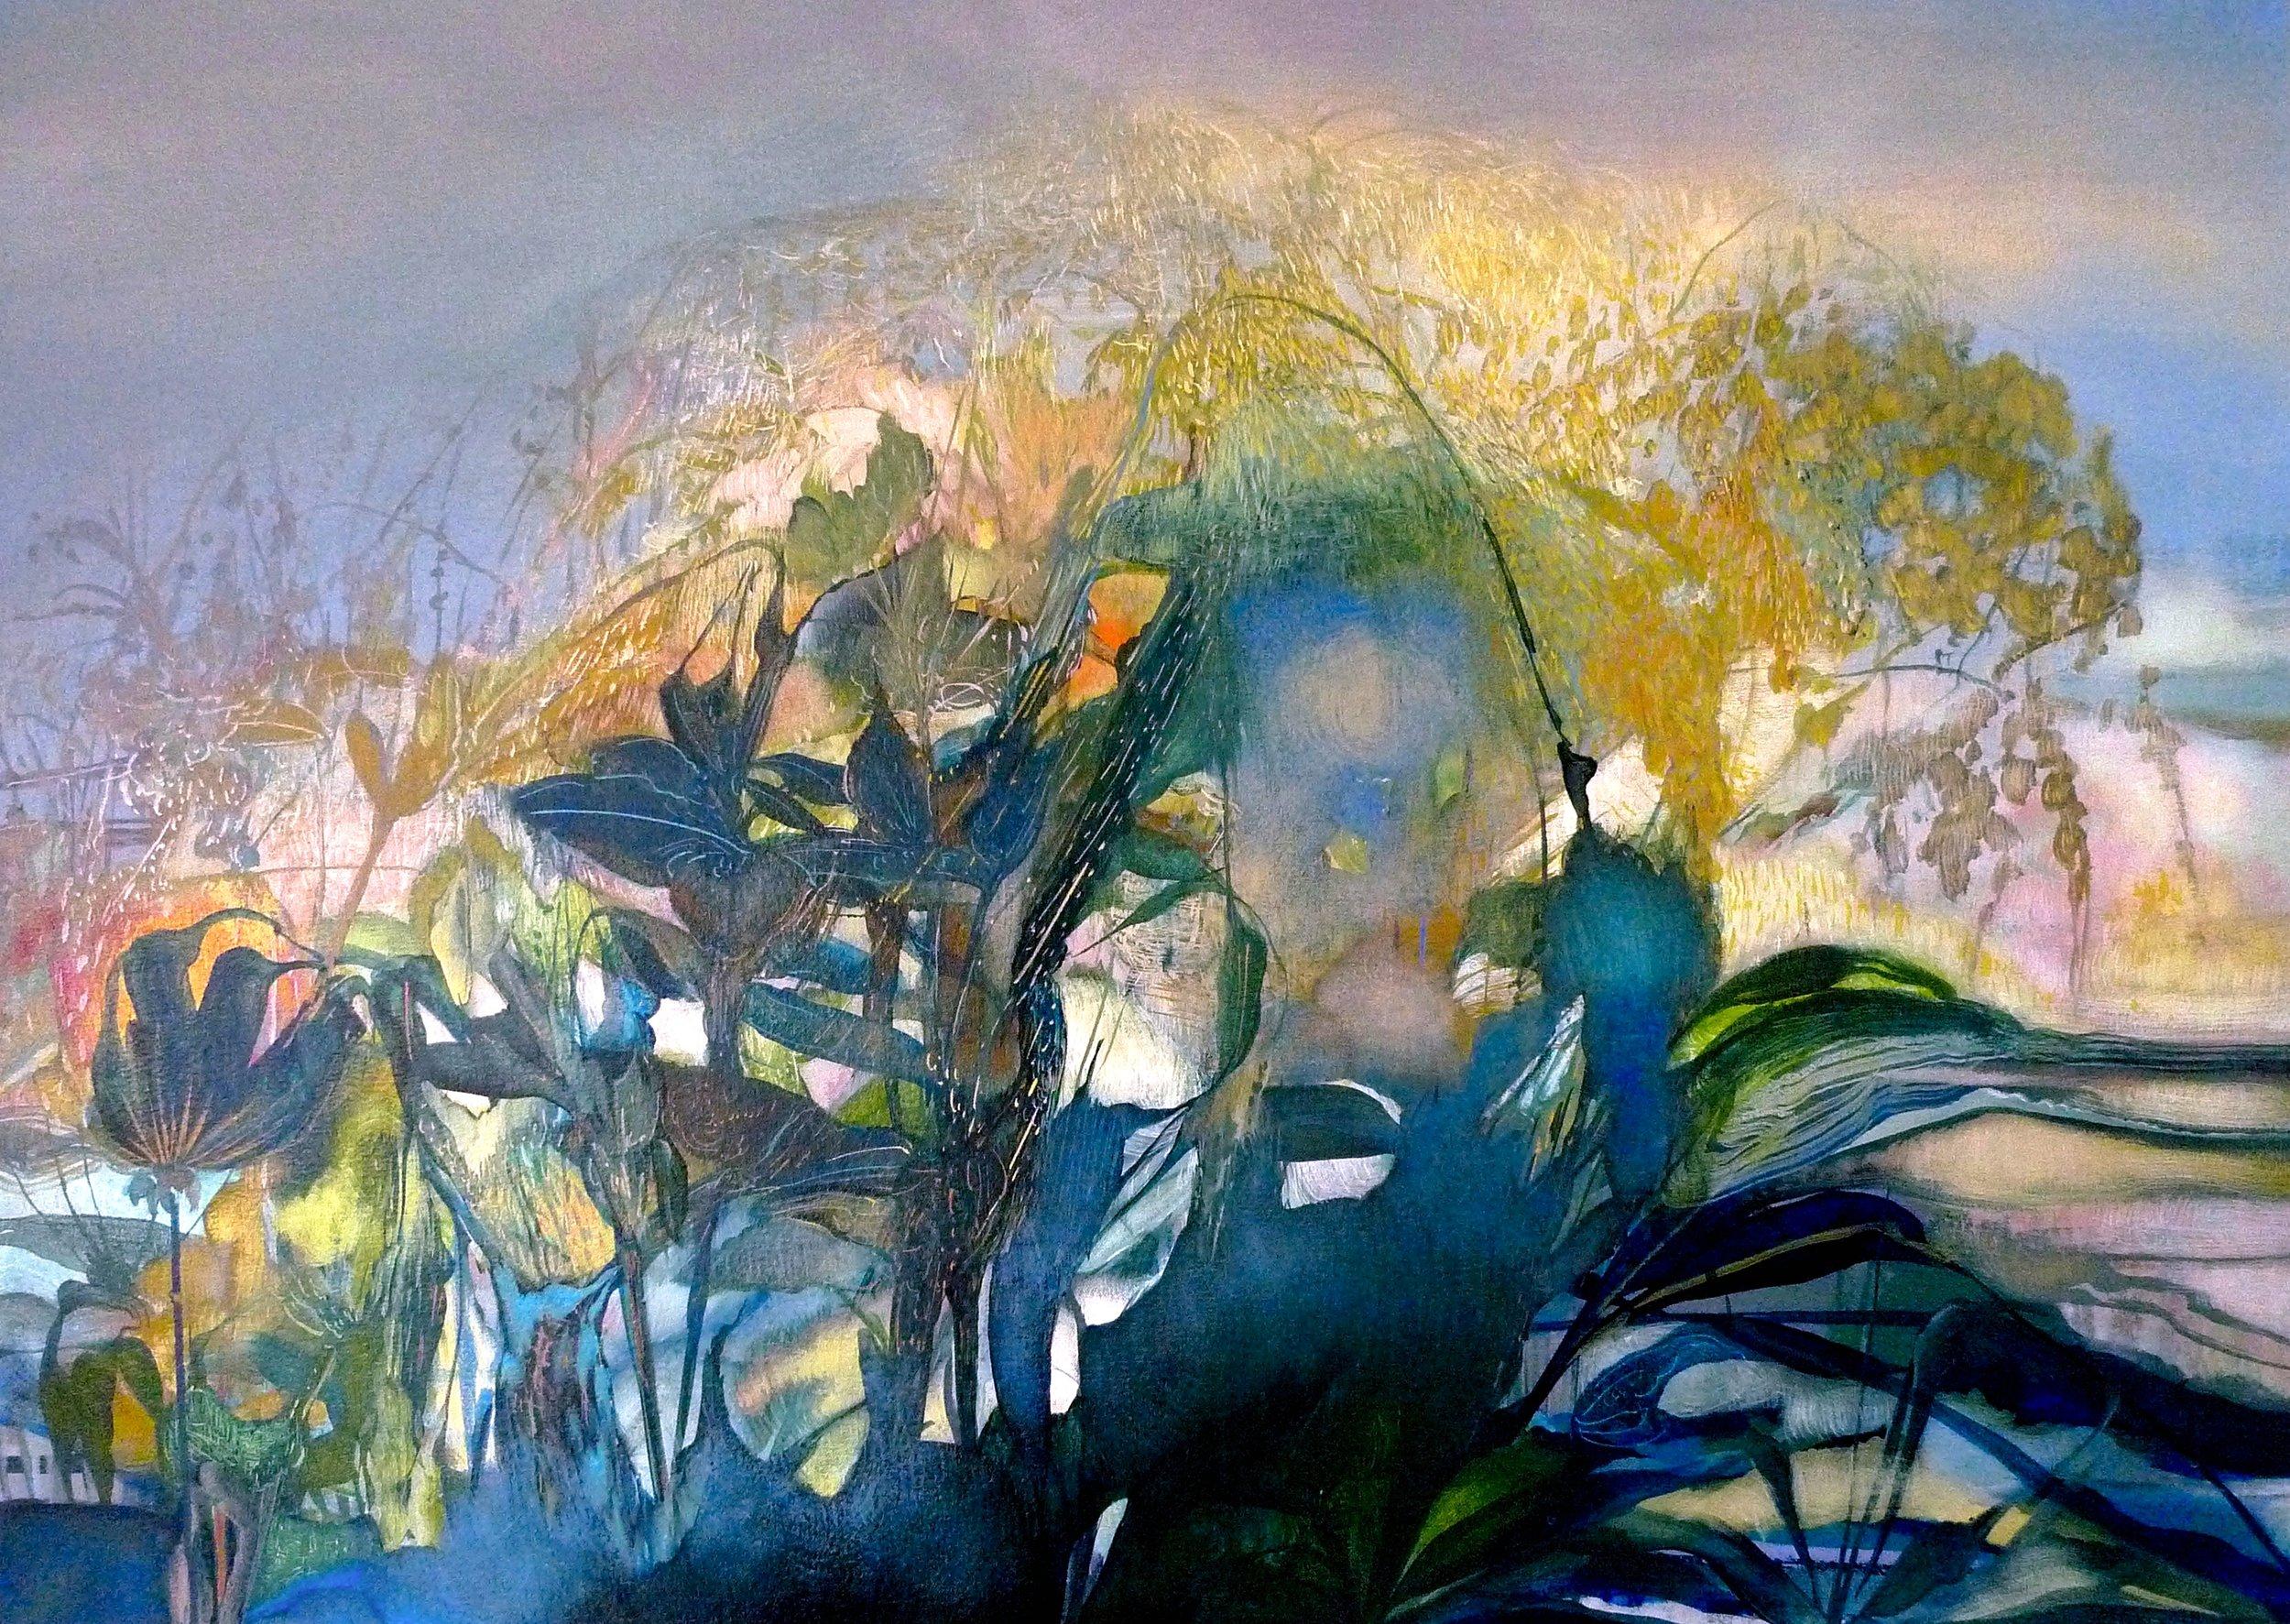 Rain and Twilight, 2017, 33 x 44 inches, acrylic on canvas